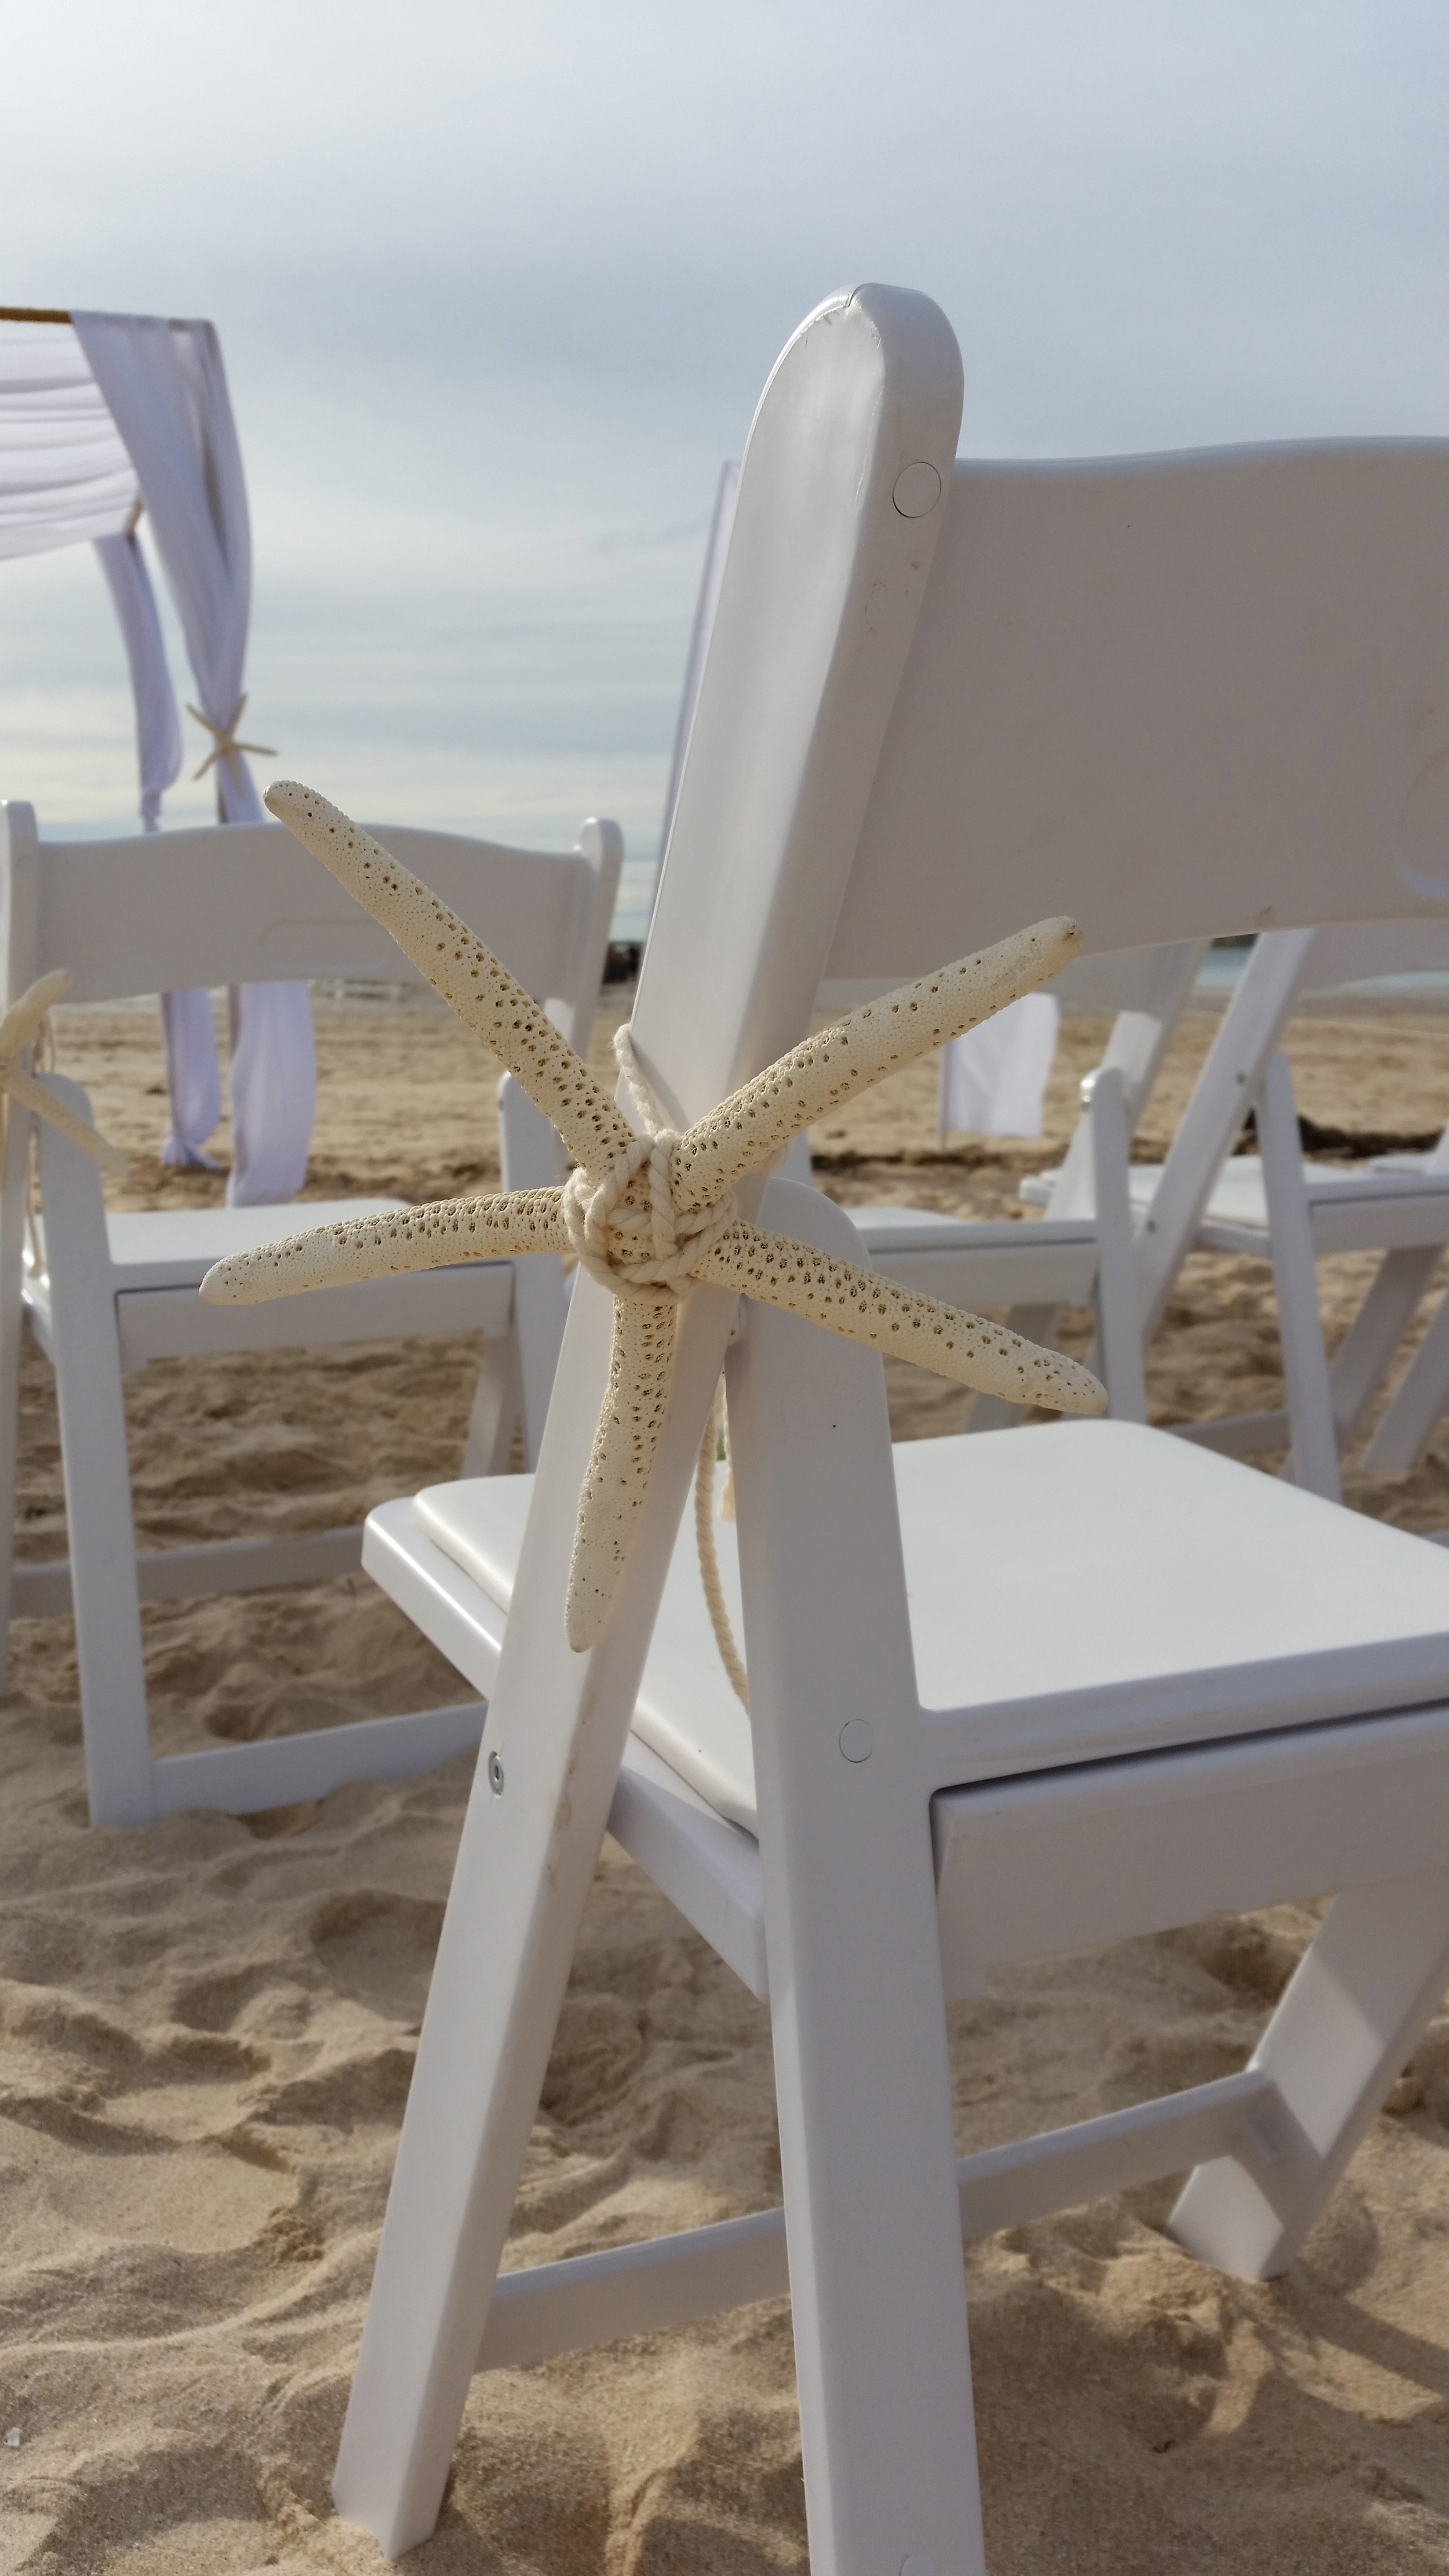 Gladiator Chairs with Large Starfish